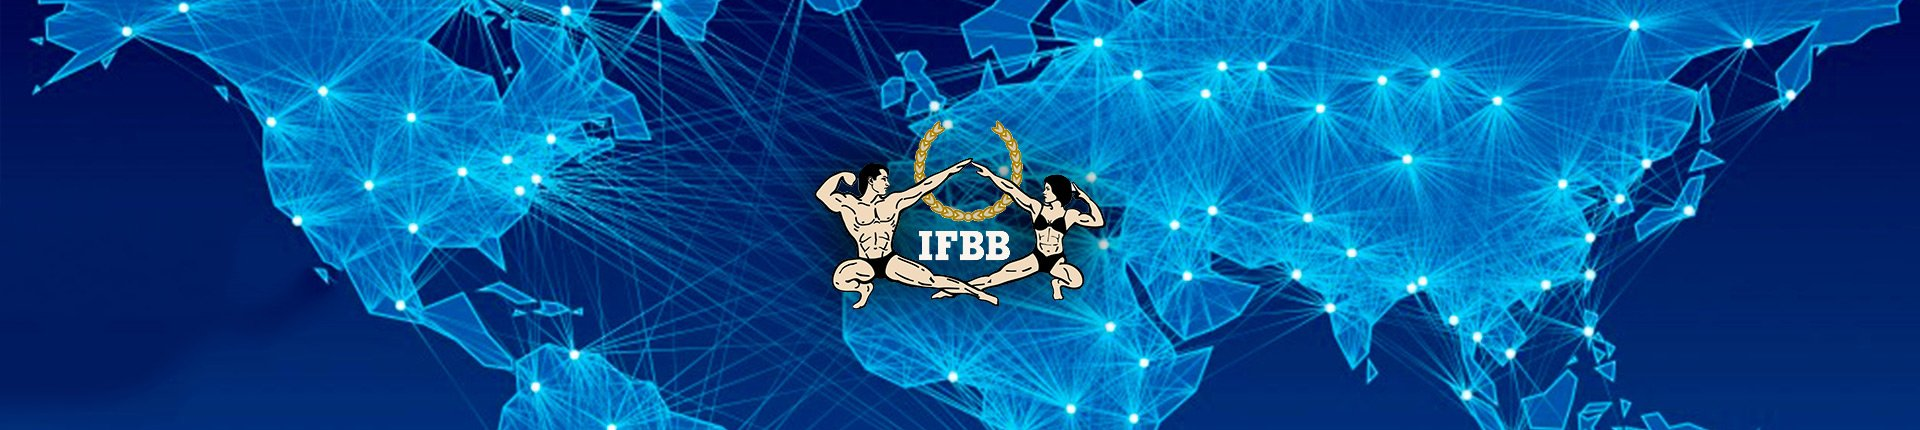 Reprezentacja Polski - IFBB Malta Diamond CUP 2019